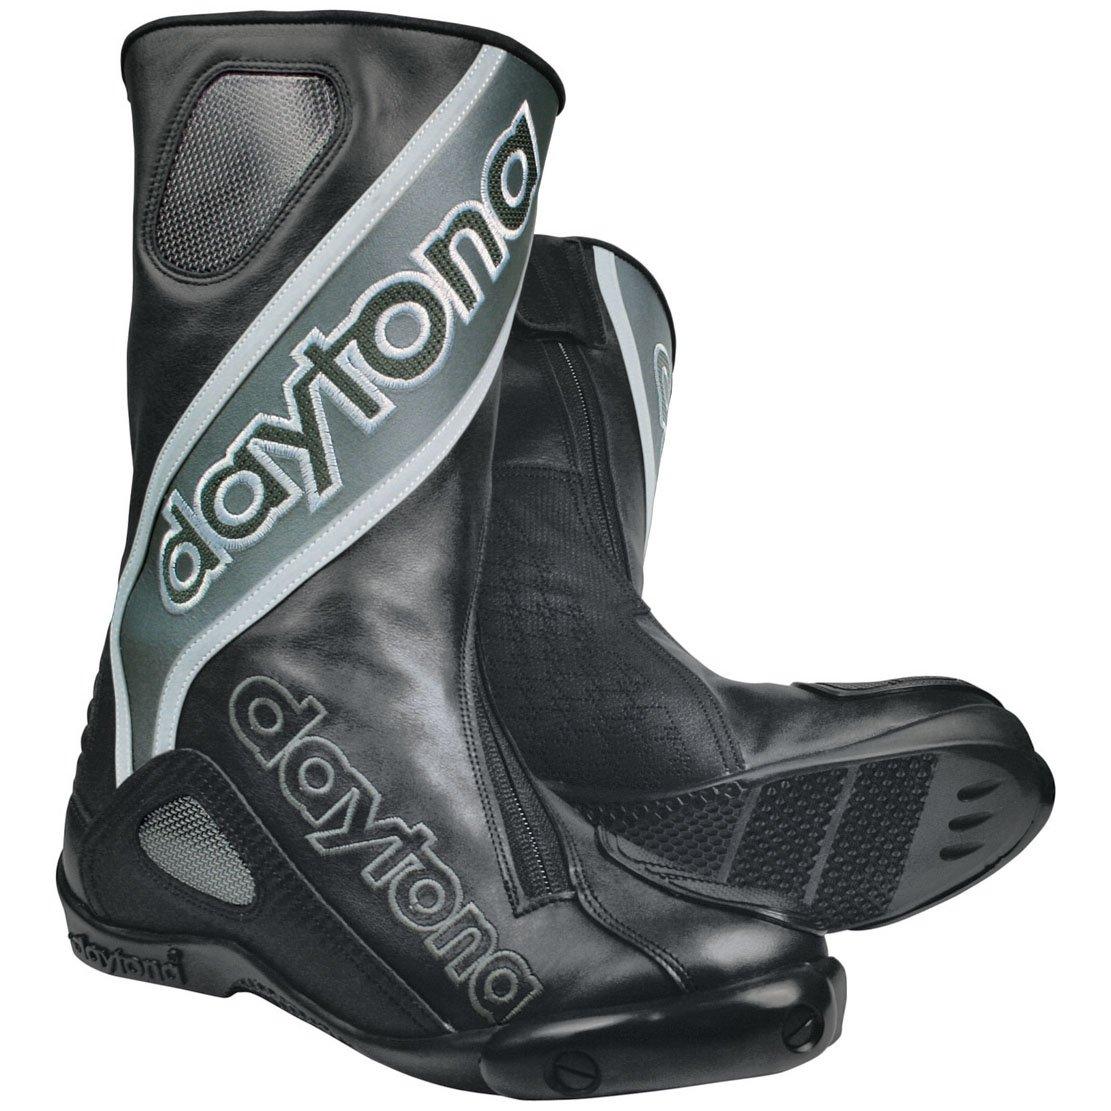 Daytona EVO SPORTS GTX Herren Racing Motorradstiefel Leder